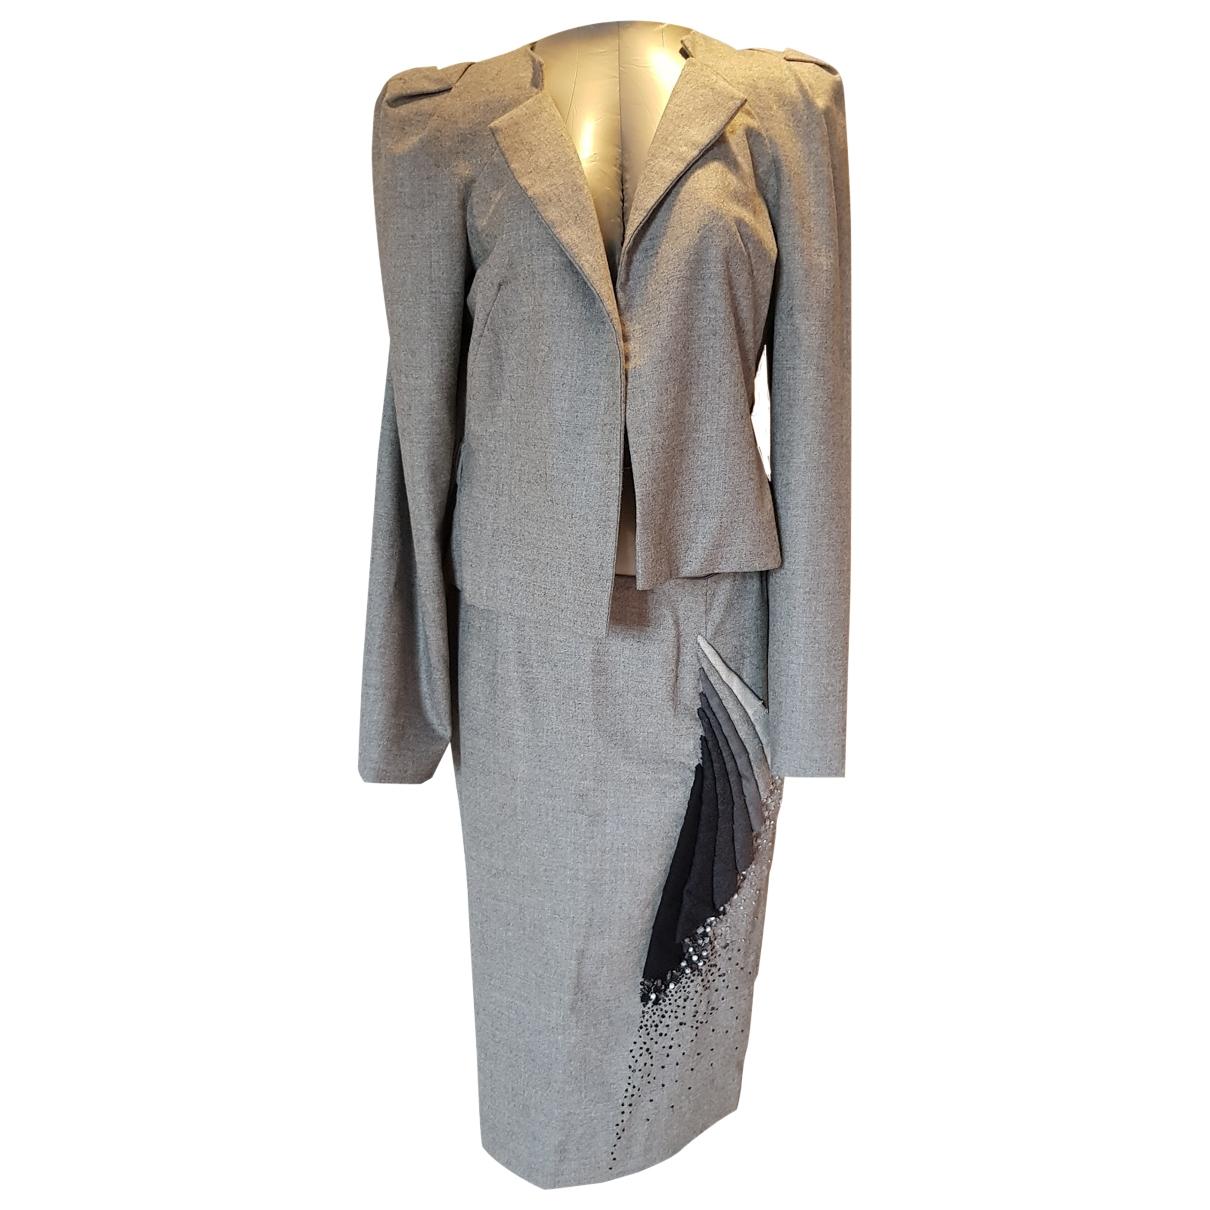 Carolina Herrera \N Grey Wool jacket for Women 8 US